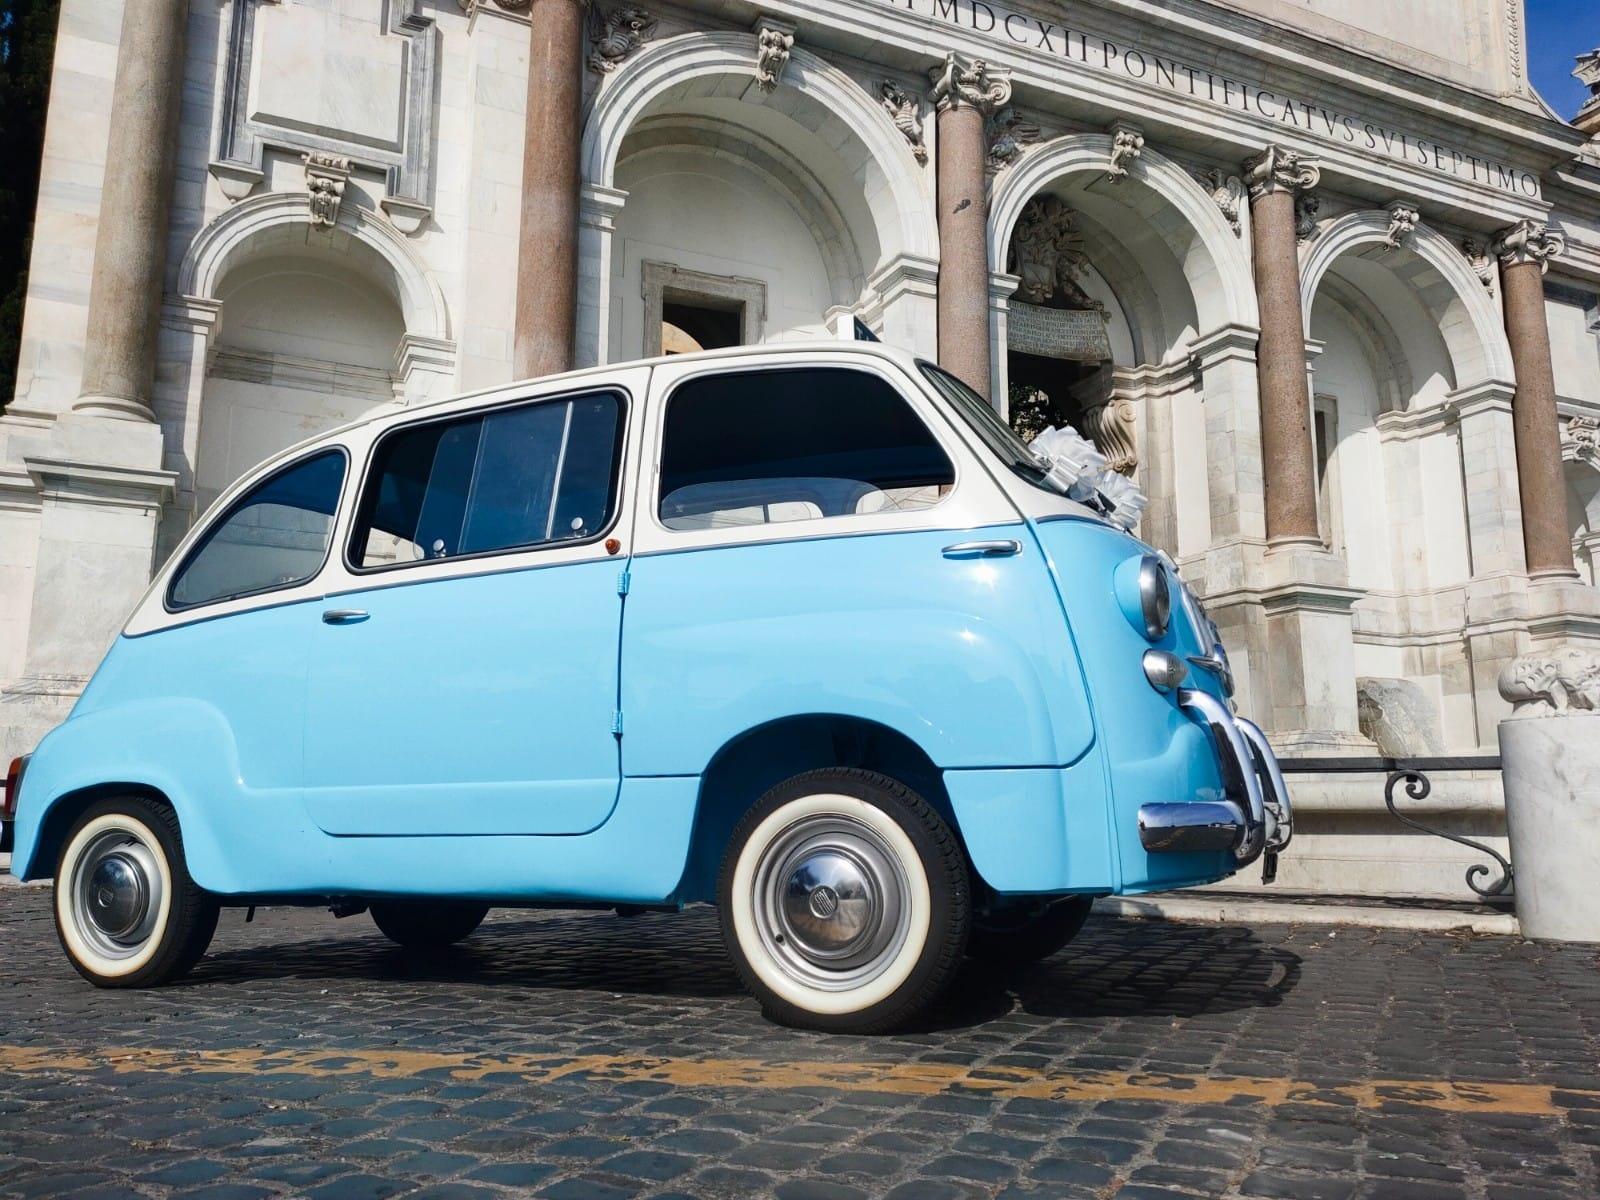 Noleggio auto d'epoca a Roma per matrimoni ed eventi | Fiat 600 multipla top vintage